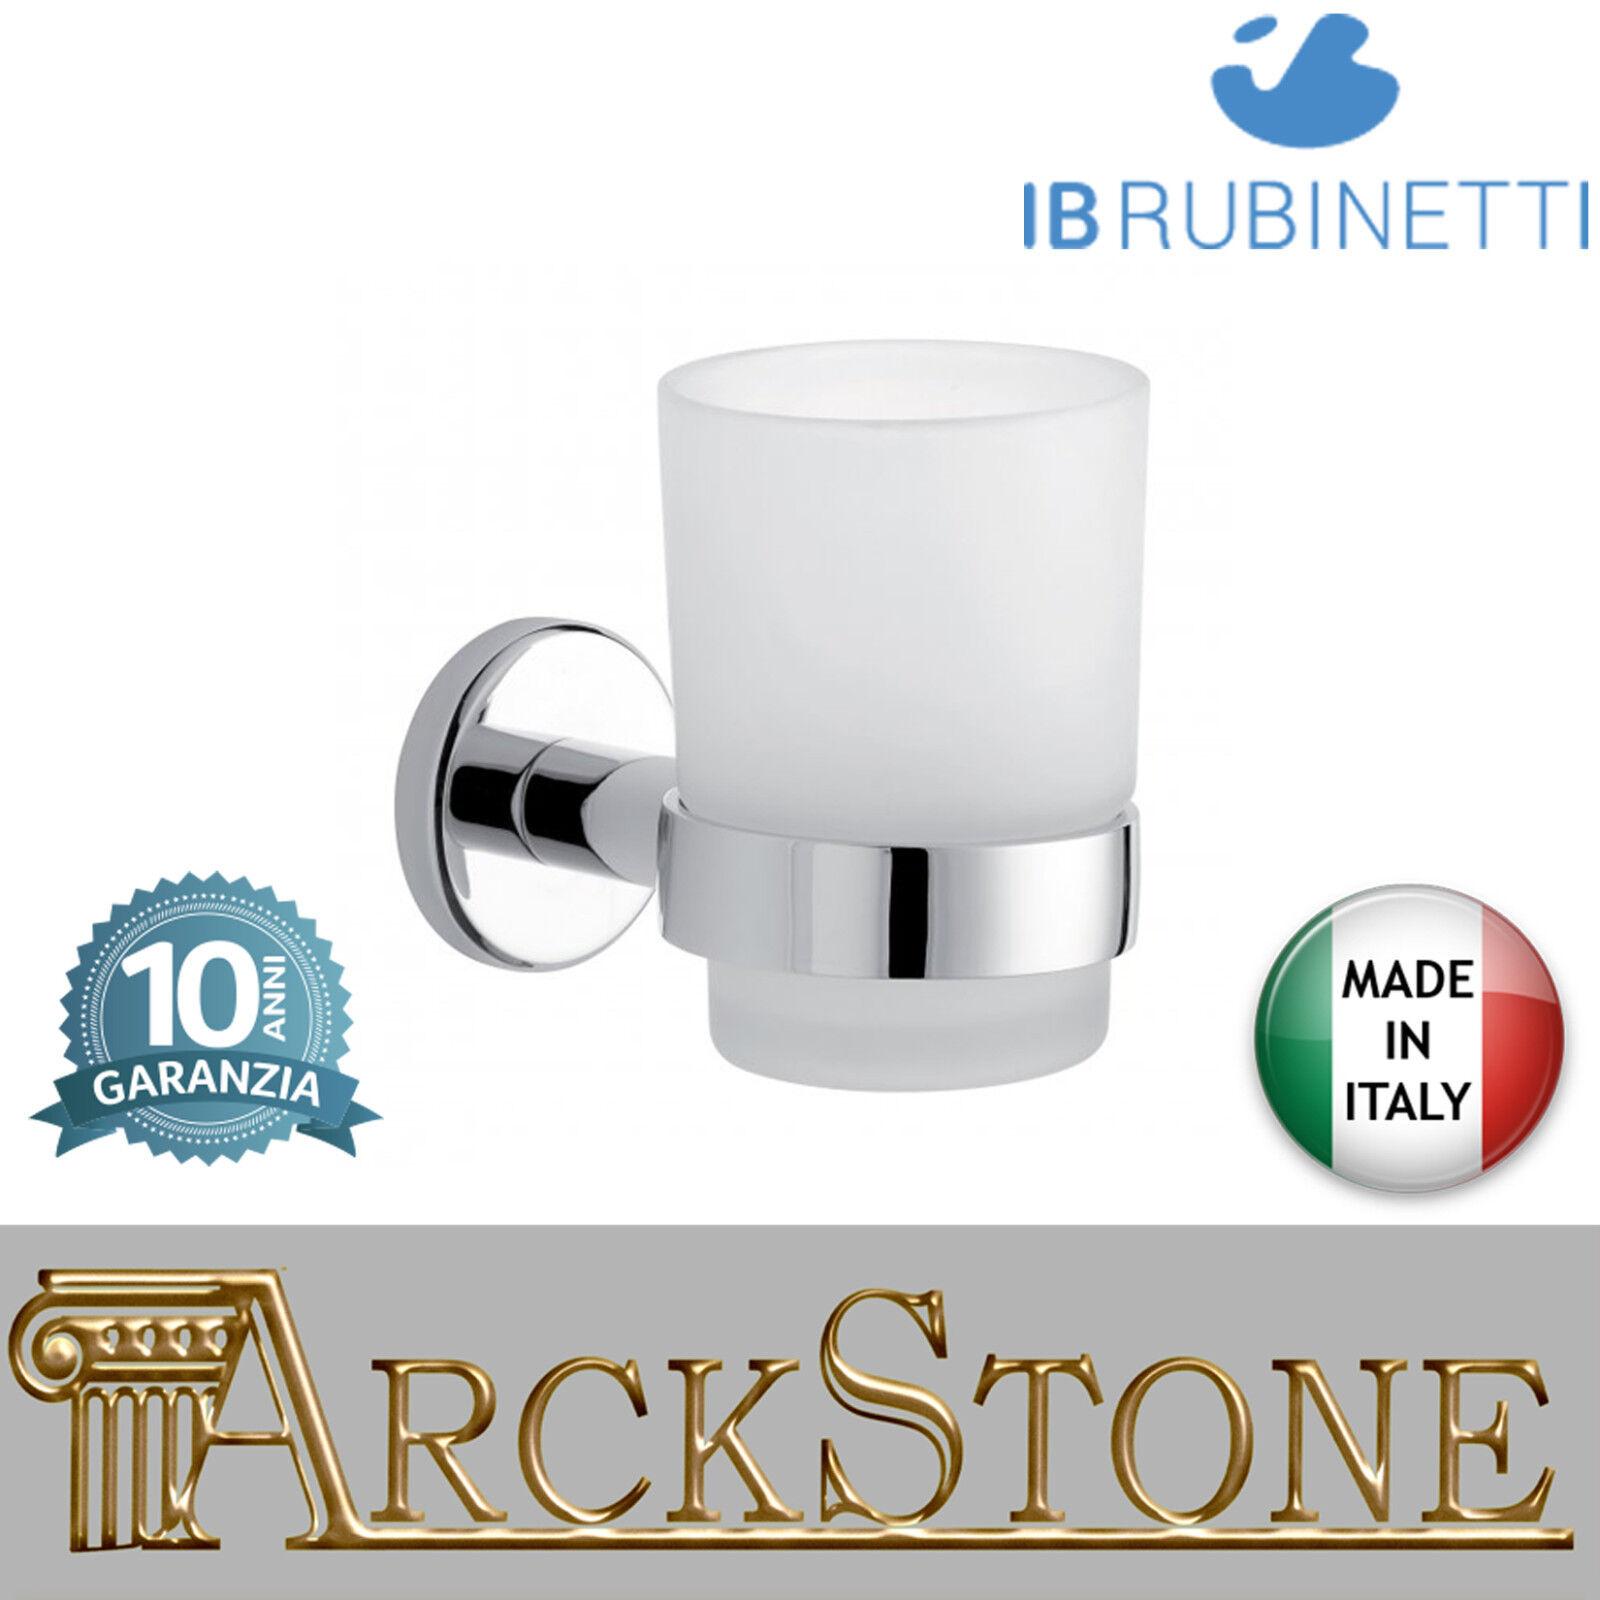 Porte brosse à dents verre dépoli supports laiton chrome IB Rubinetti Moderne